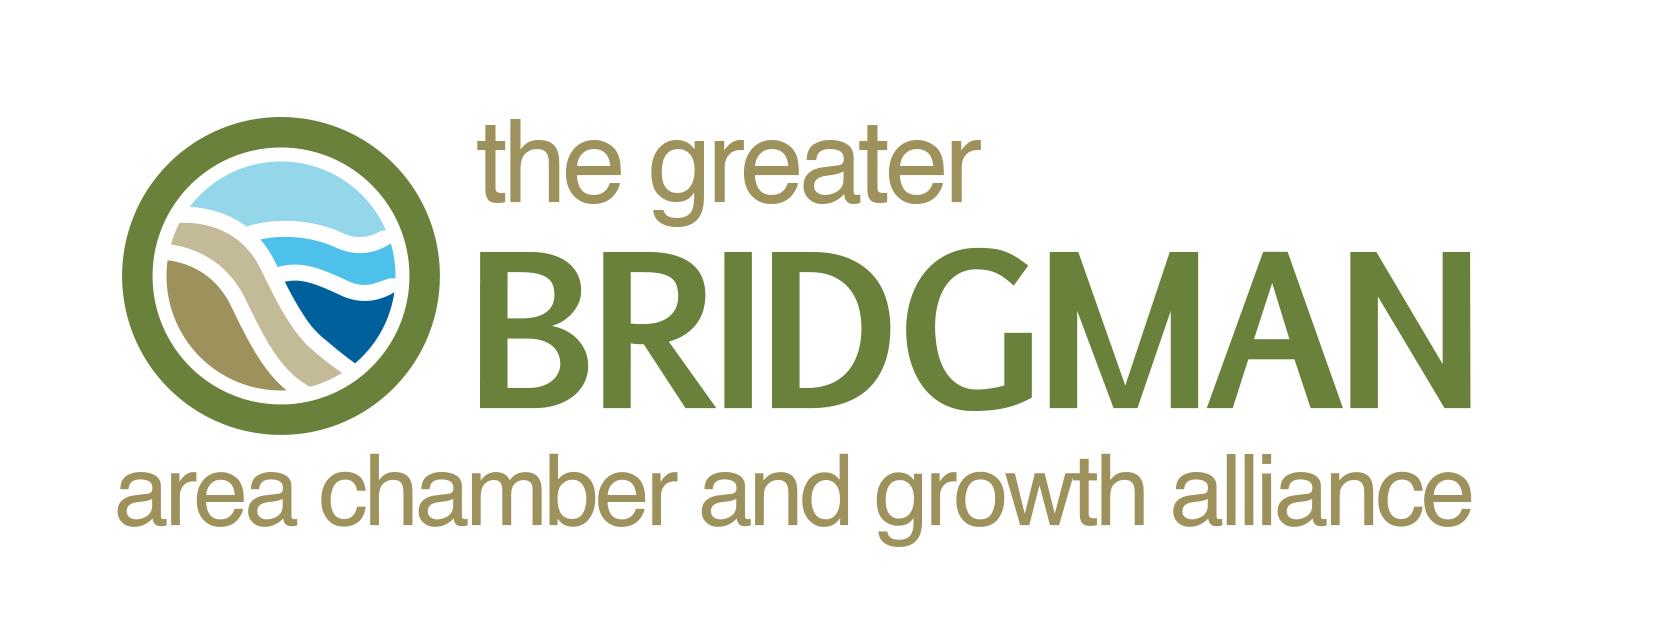 Buy Local Bridgman Community Gift Card Digital Gift